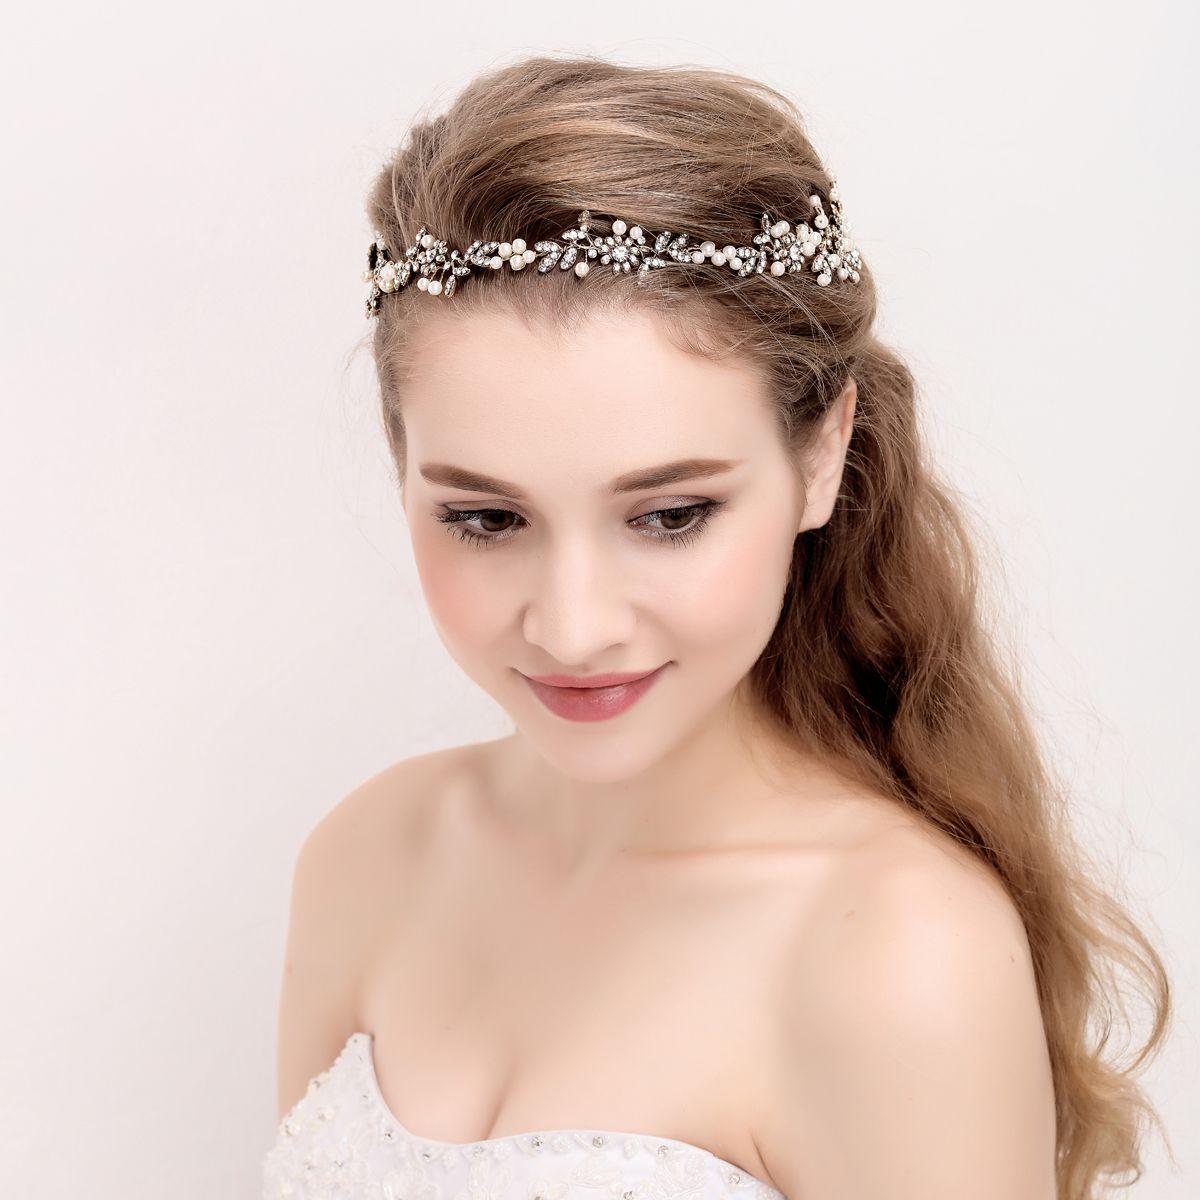 Antique Gold Bridal Headpiece Handmade Crystal Hair Vine Wedding Headband  Crown Vintage Women Party Prom Floral Hair Accessories Bridal Bracelets  Bridal ... cf921f455c0